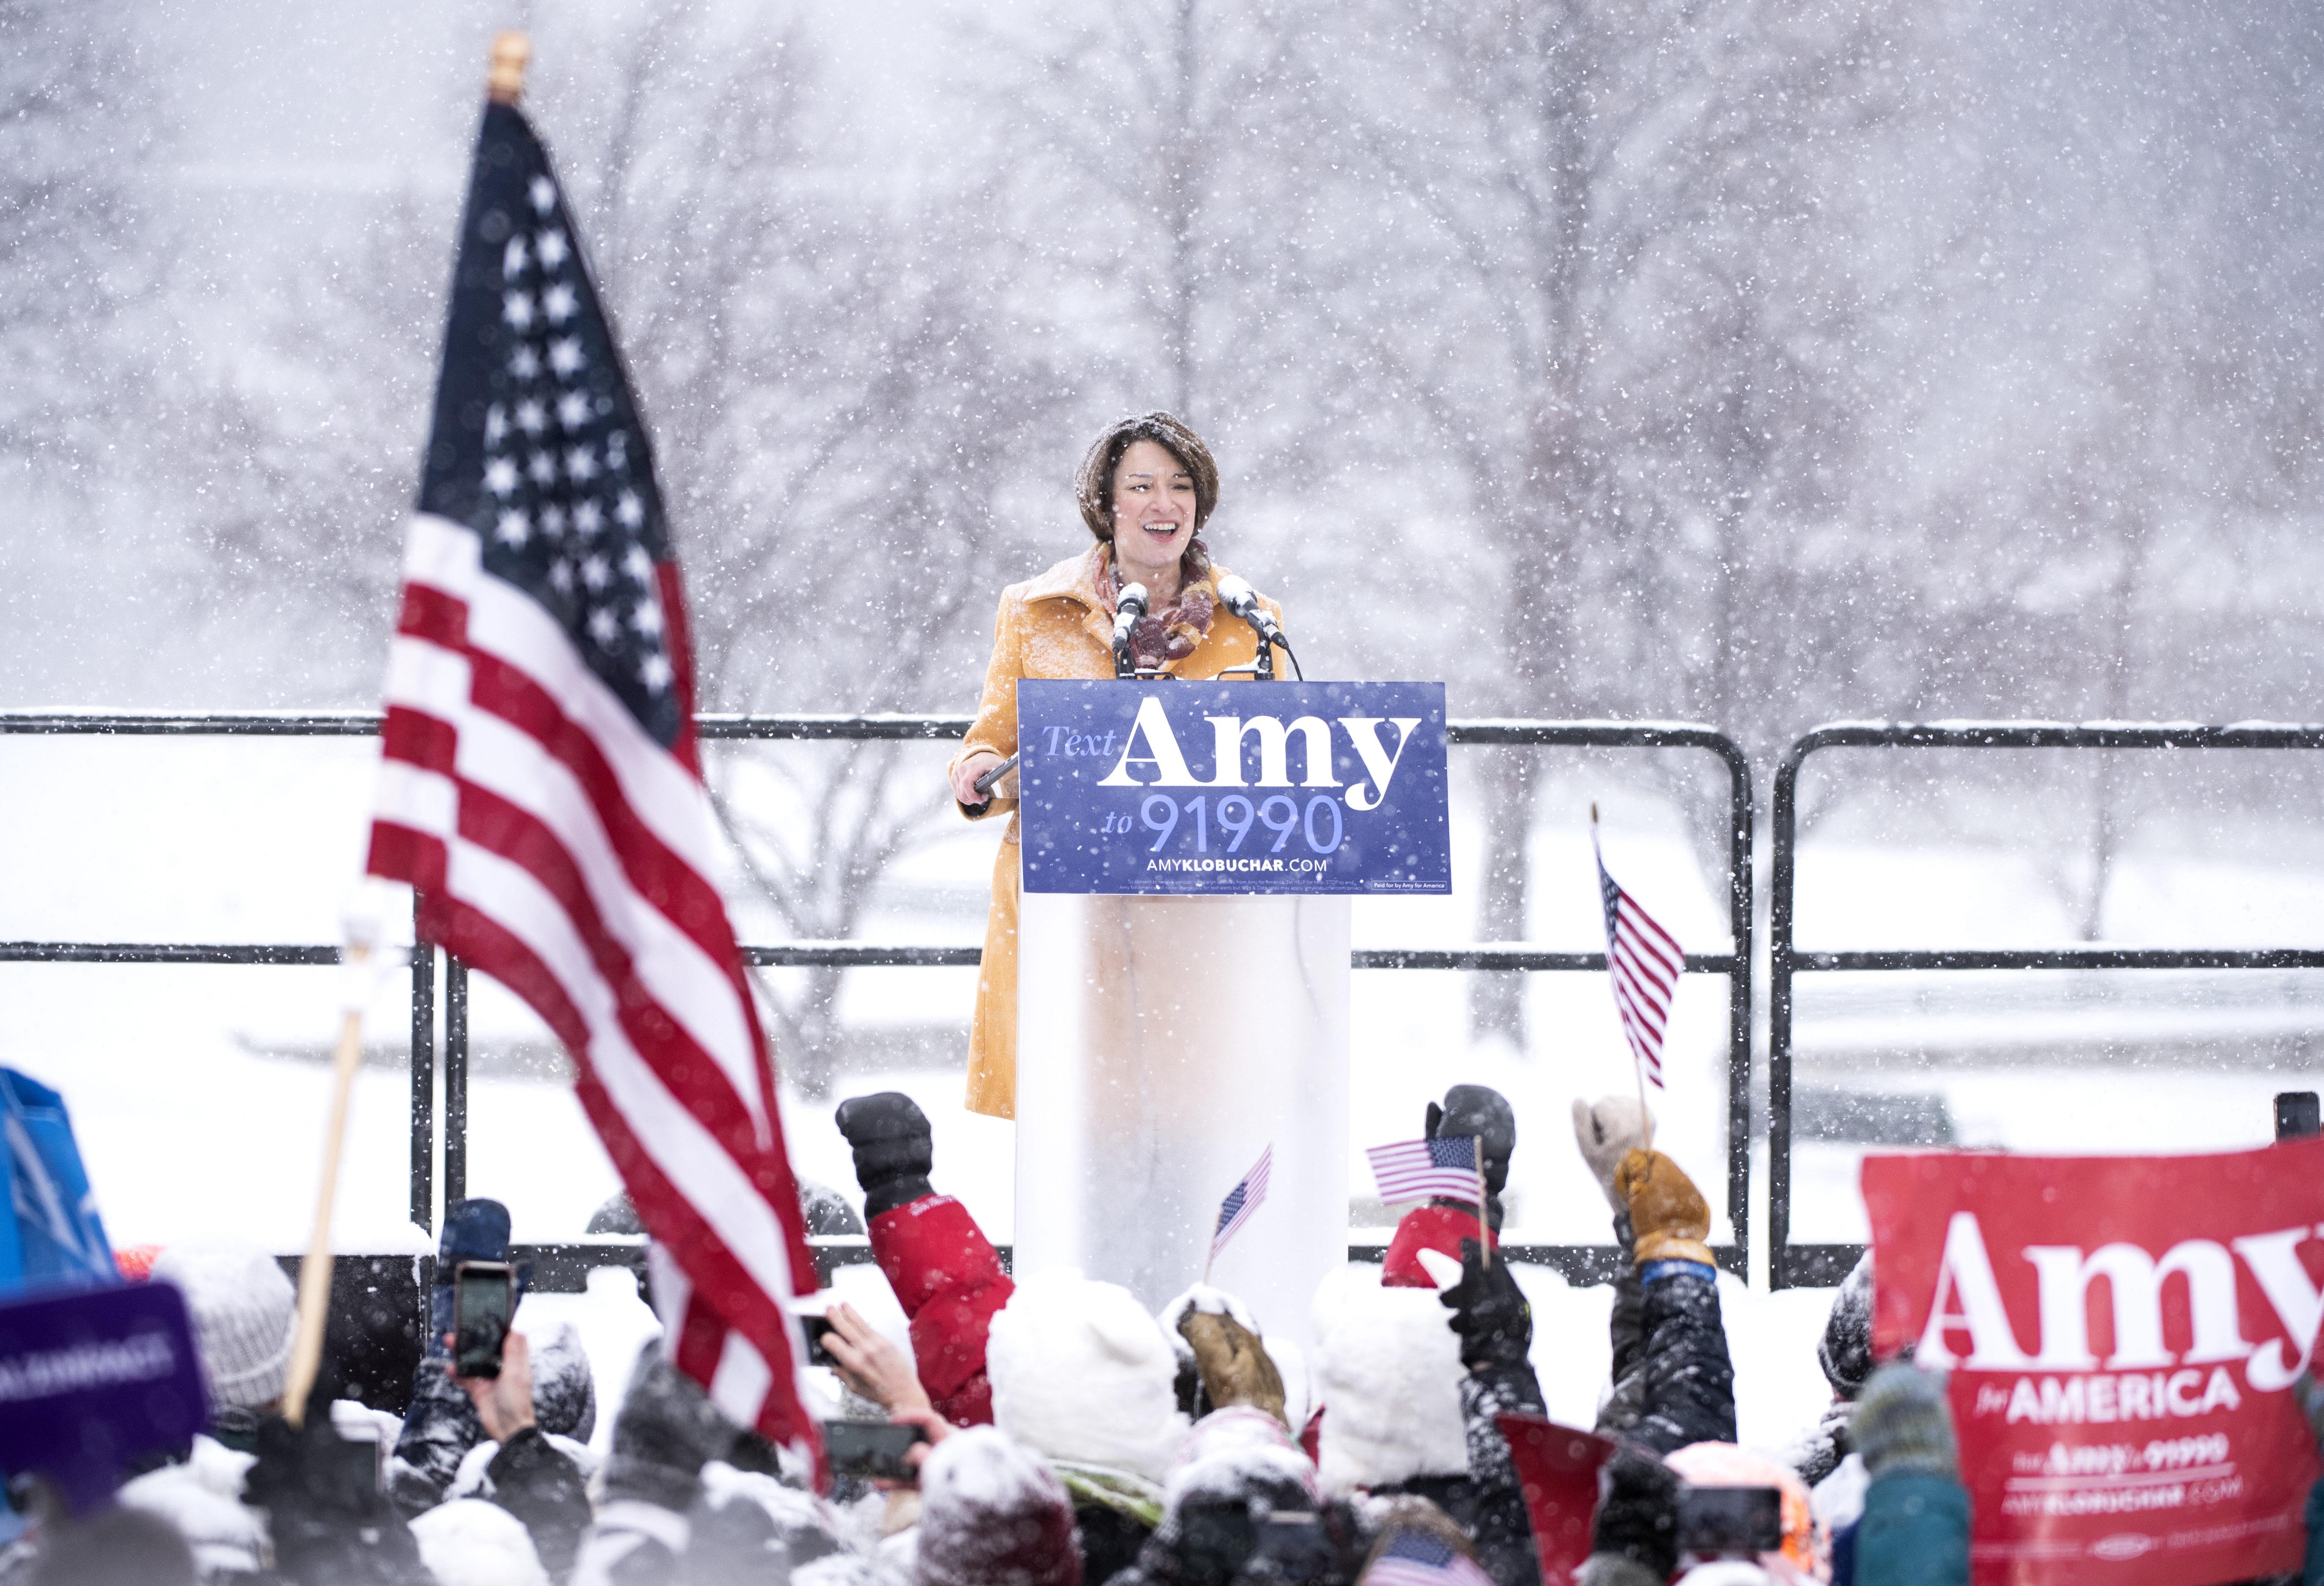 Sen. Amy Klobuchar announces her 2020 presidential bid on February 10, 2019 in Minneapolis, Minnesota. (Photo by Stephen Maturen/Getty Images)